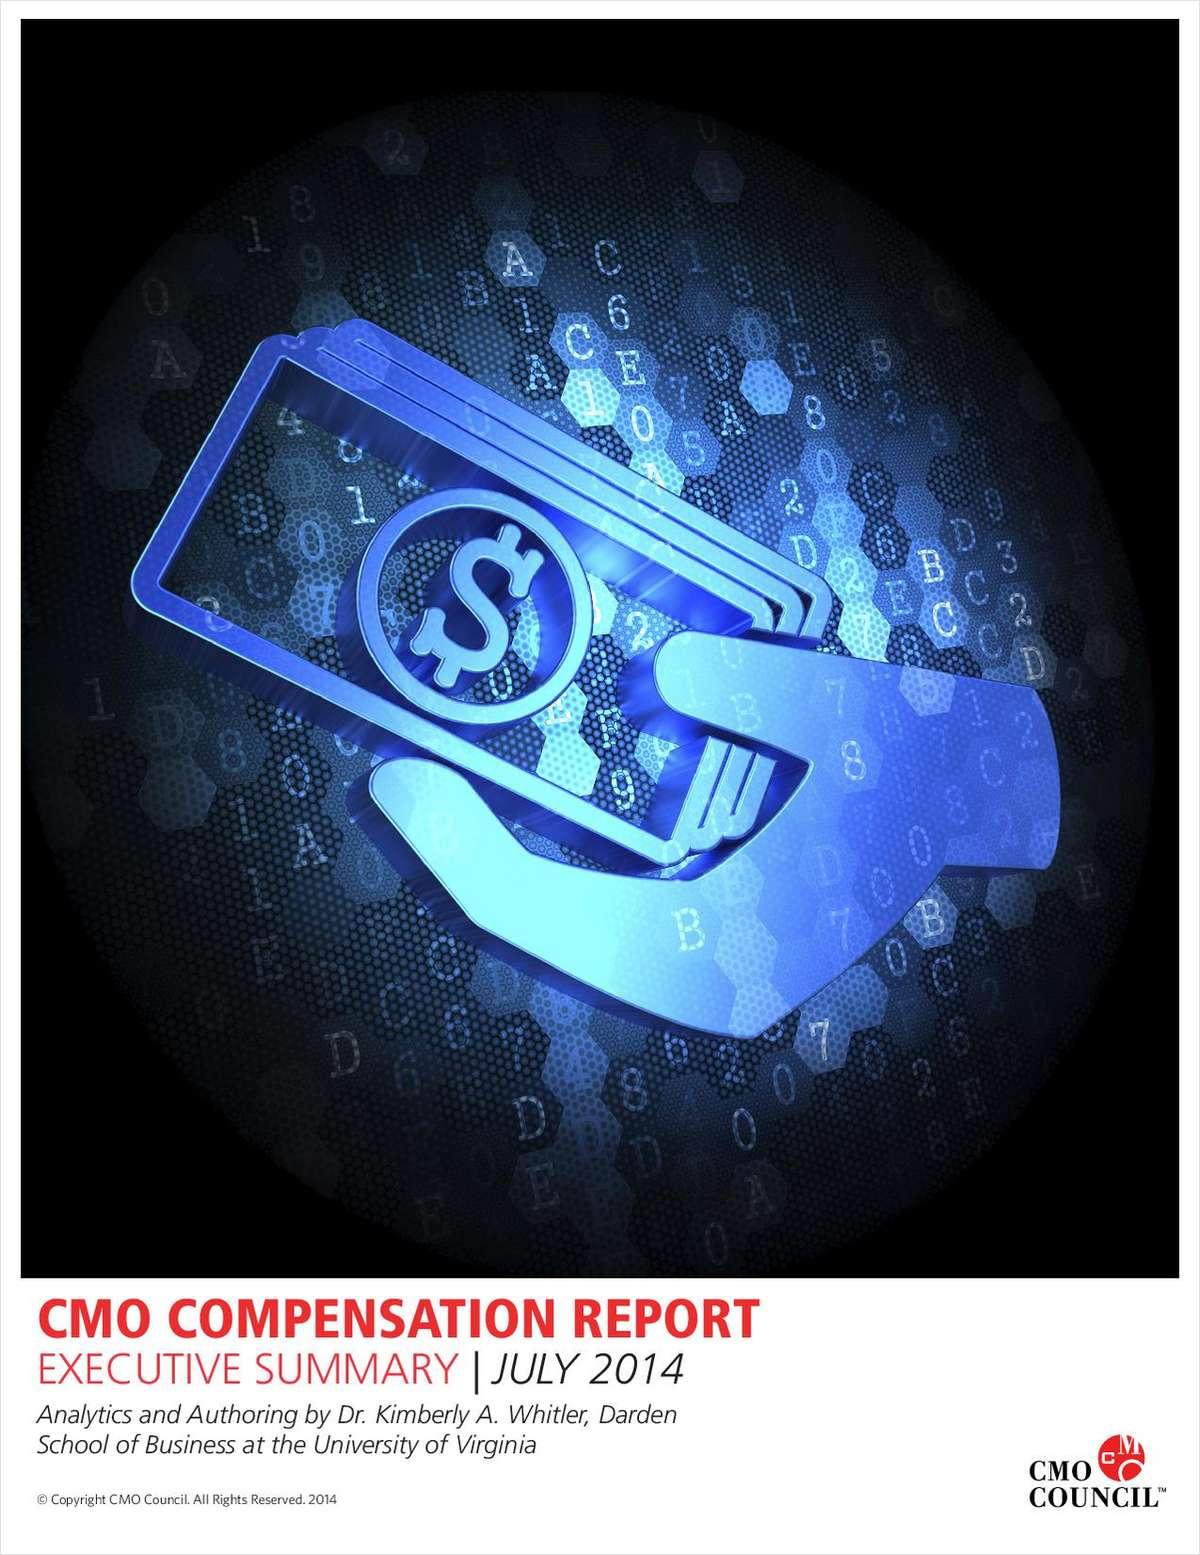 Milestone CMO Compensation Report From CMO Council